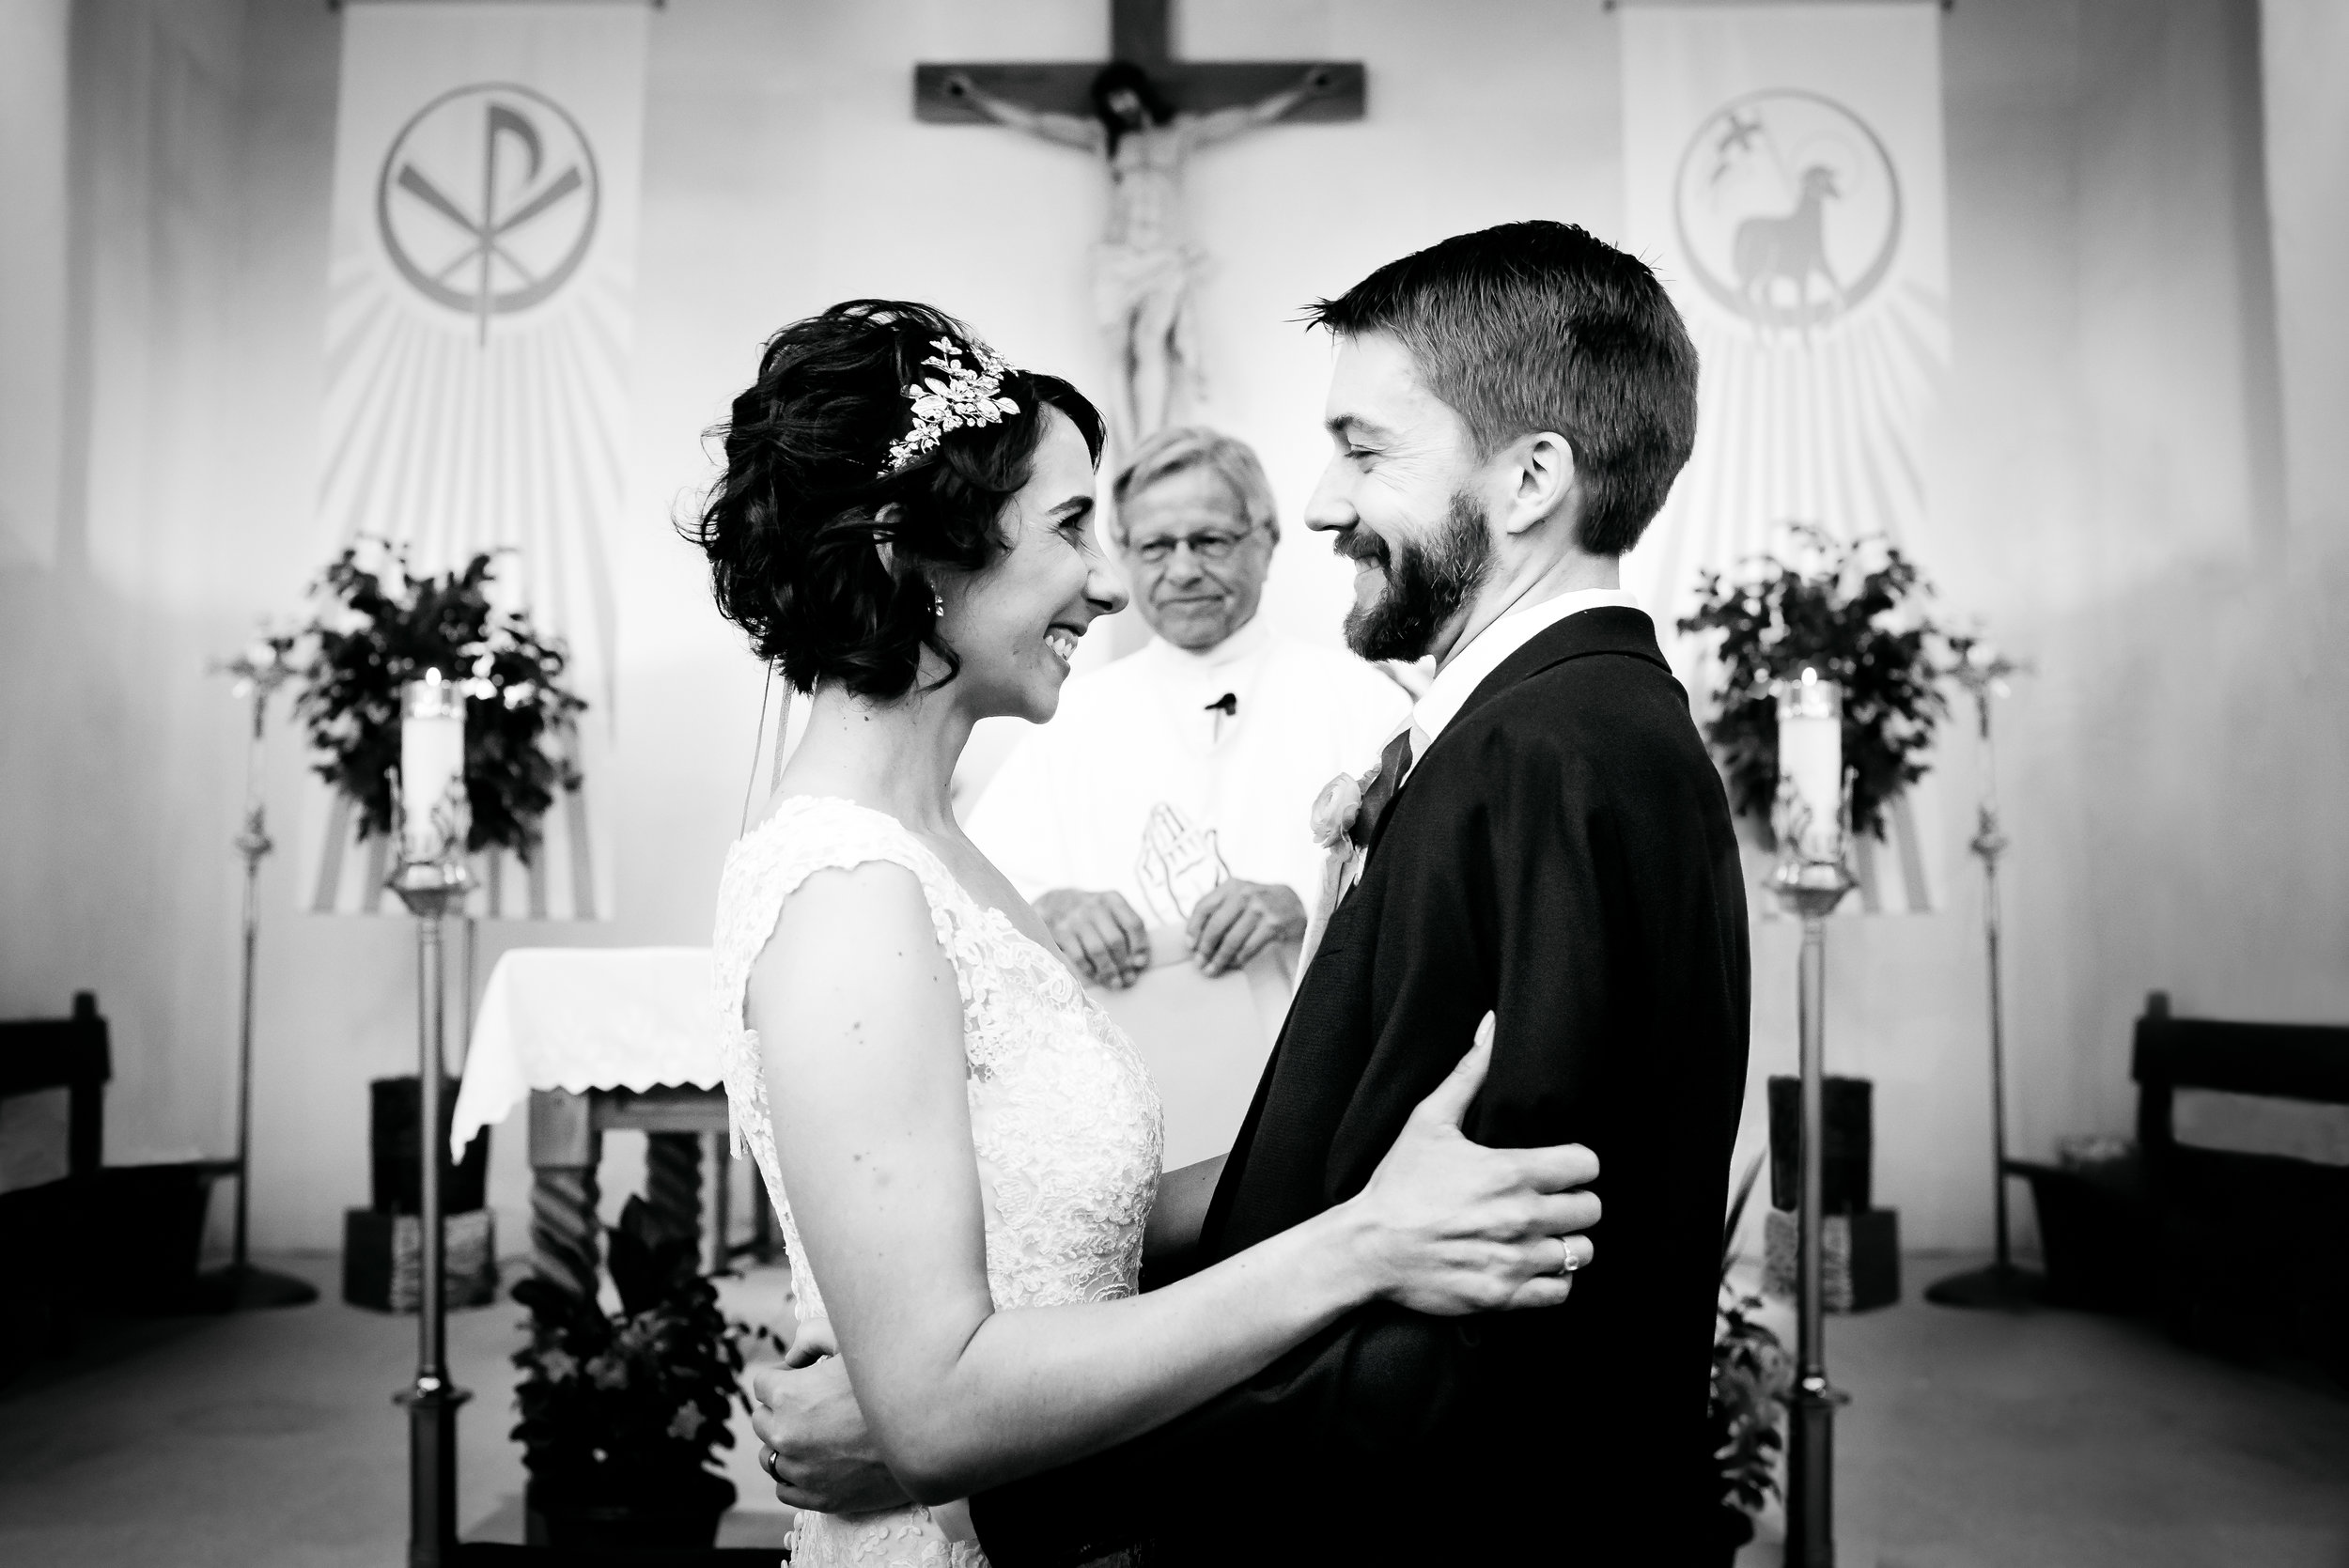 Extended_Play_Photography_Carmella_Wedding-11.jpg